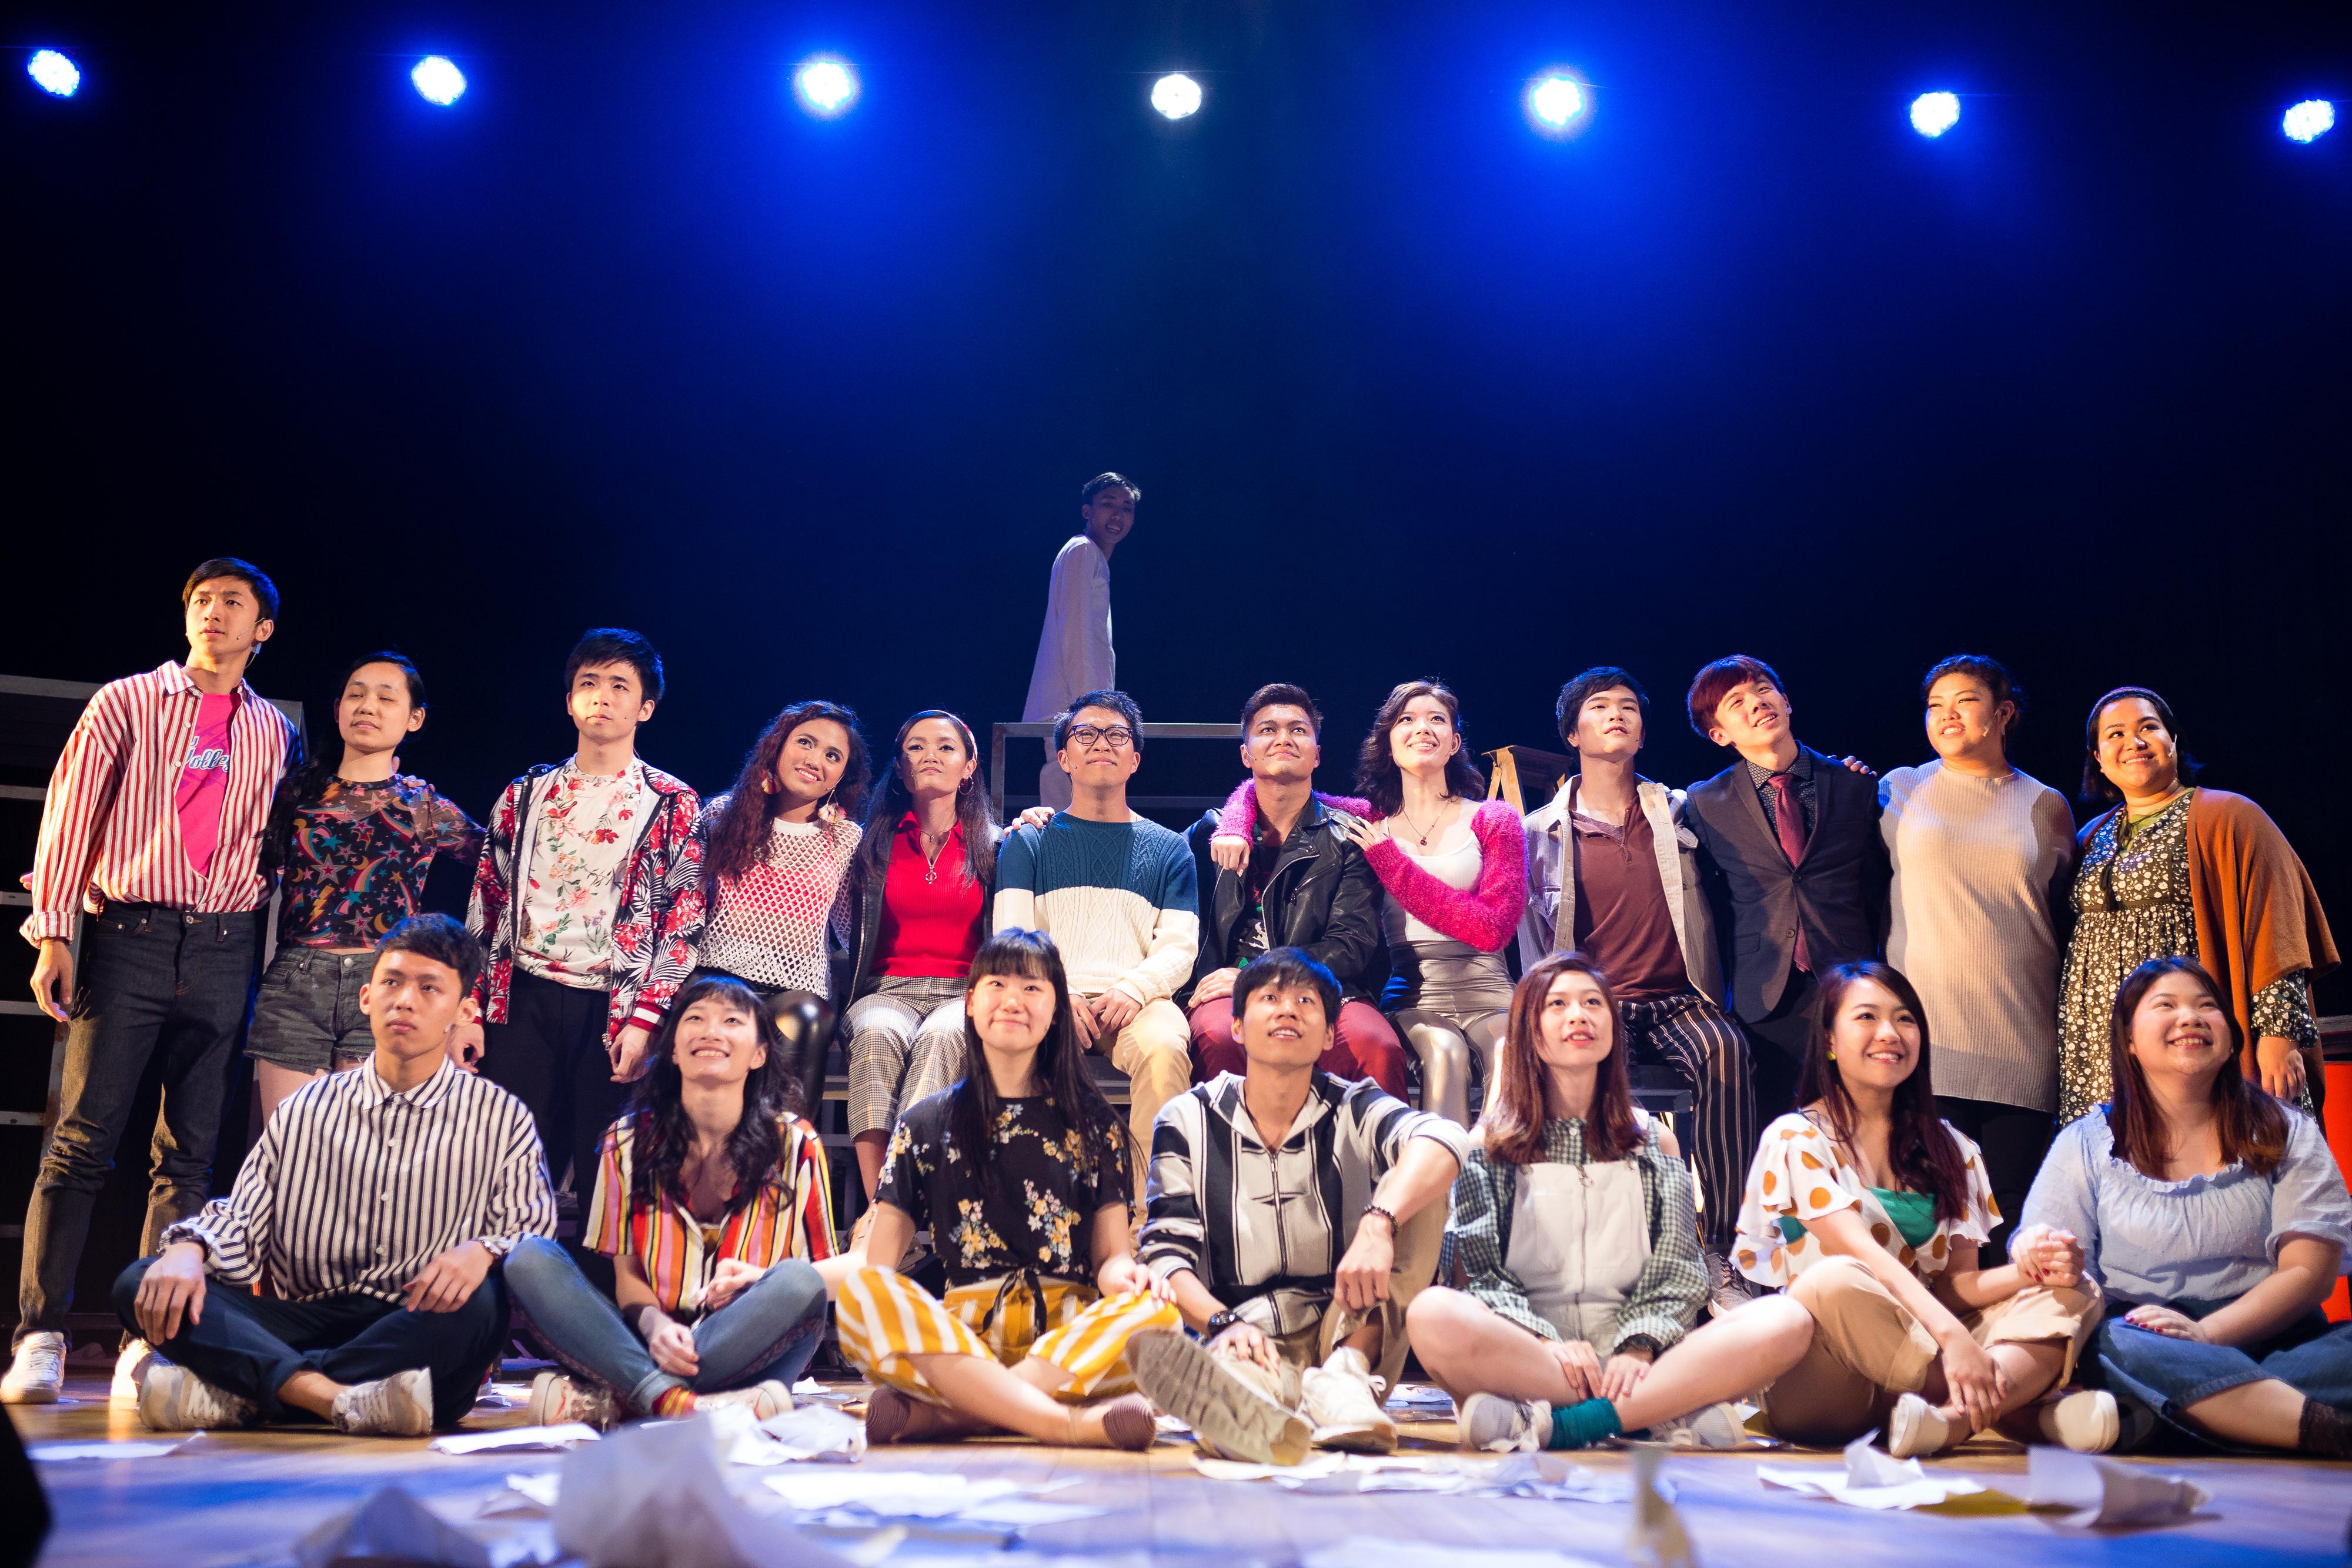 Rent/人物:Basnet Tusar、簡淑梅/類別:School Production、演出/攝影:艾浩家/(天台製作 • 香港專業劇團)